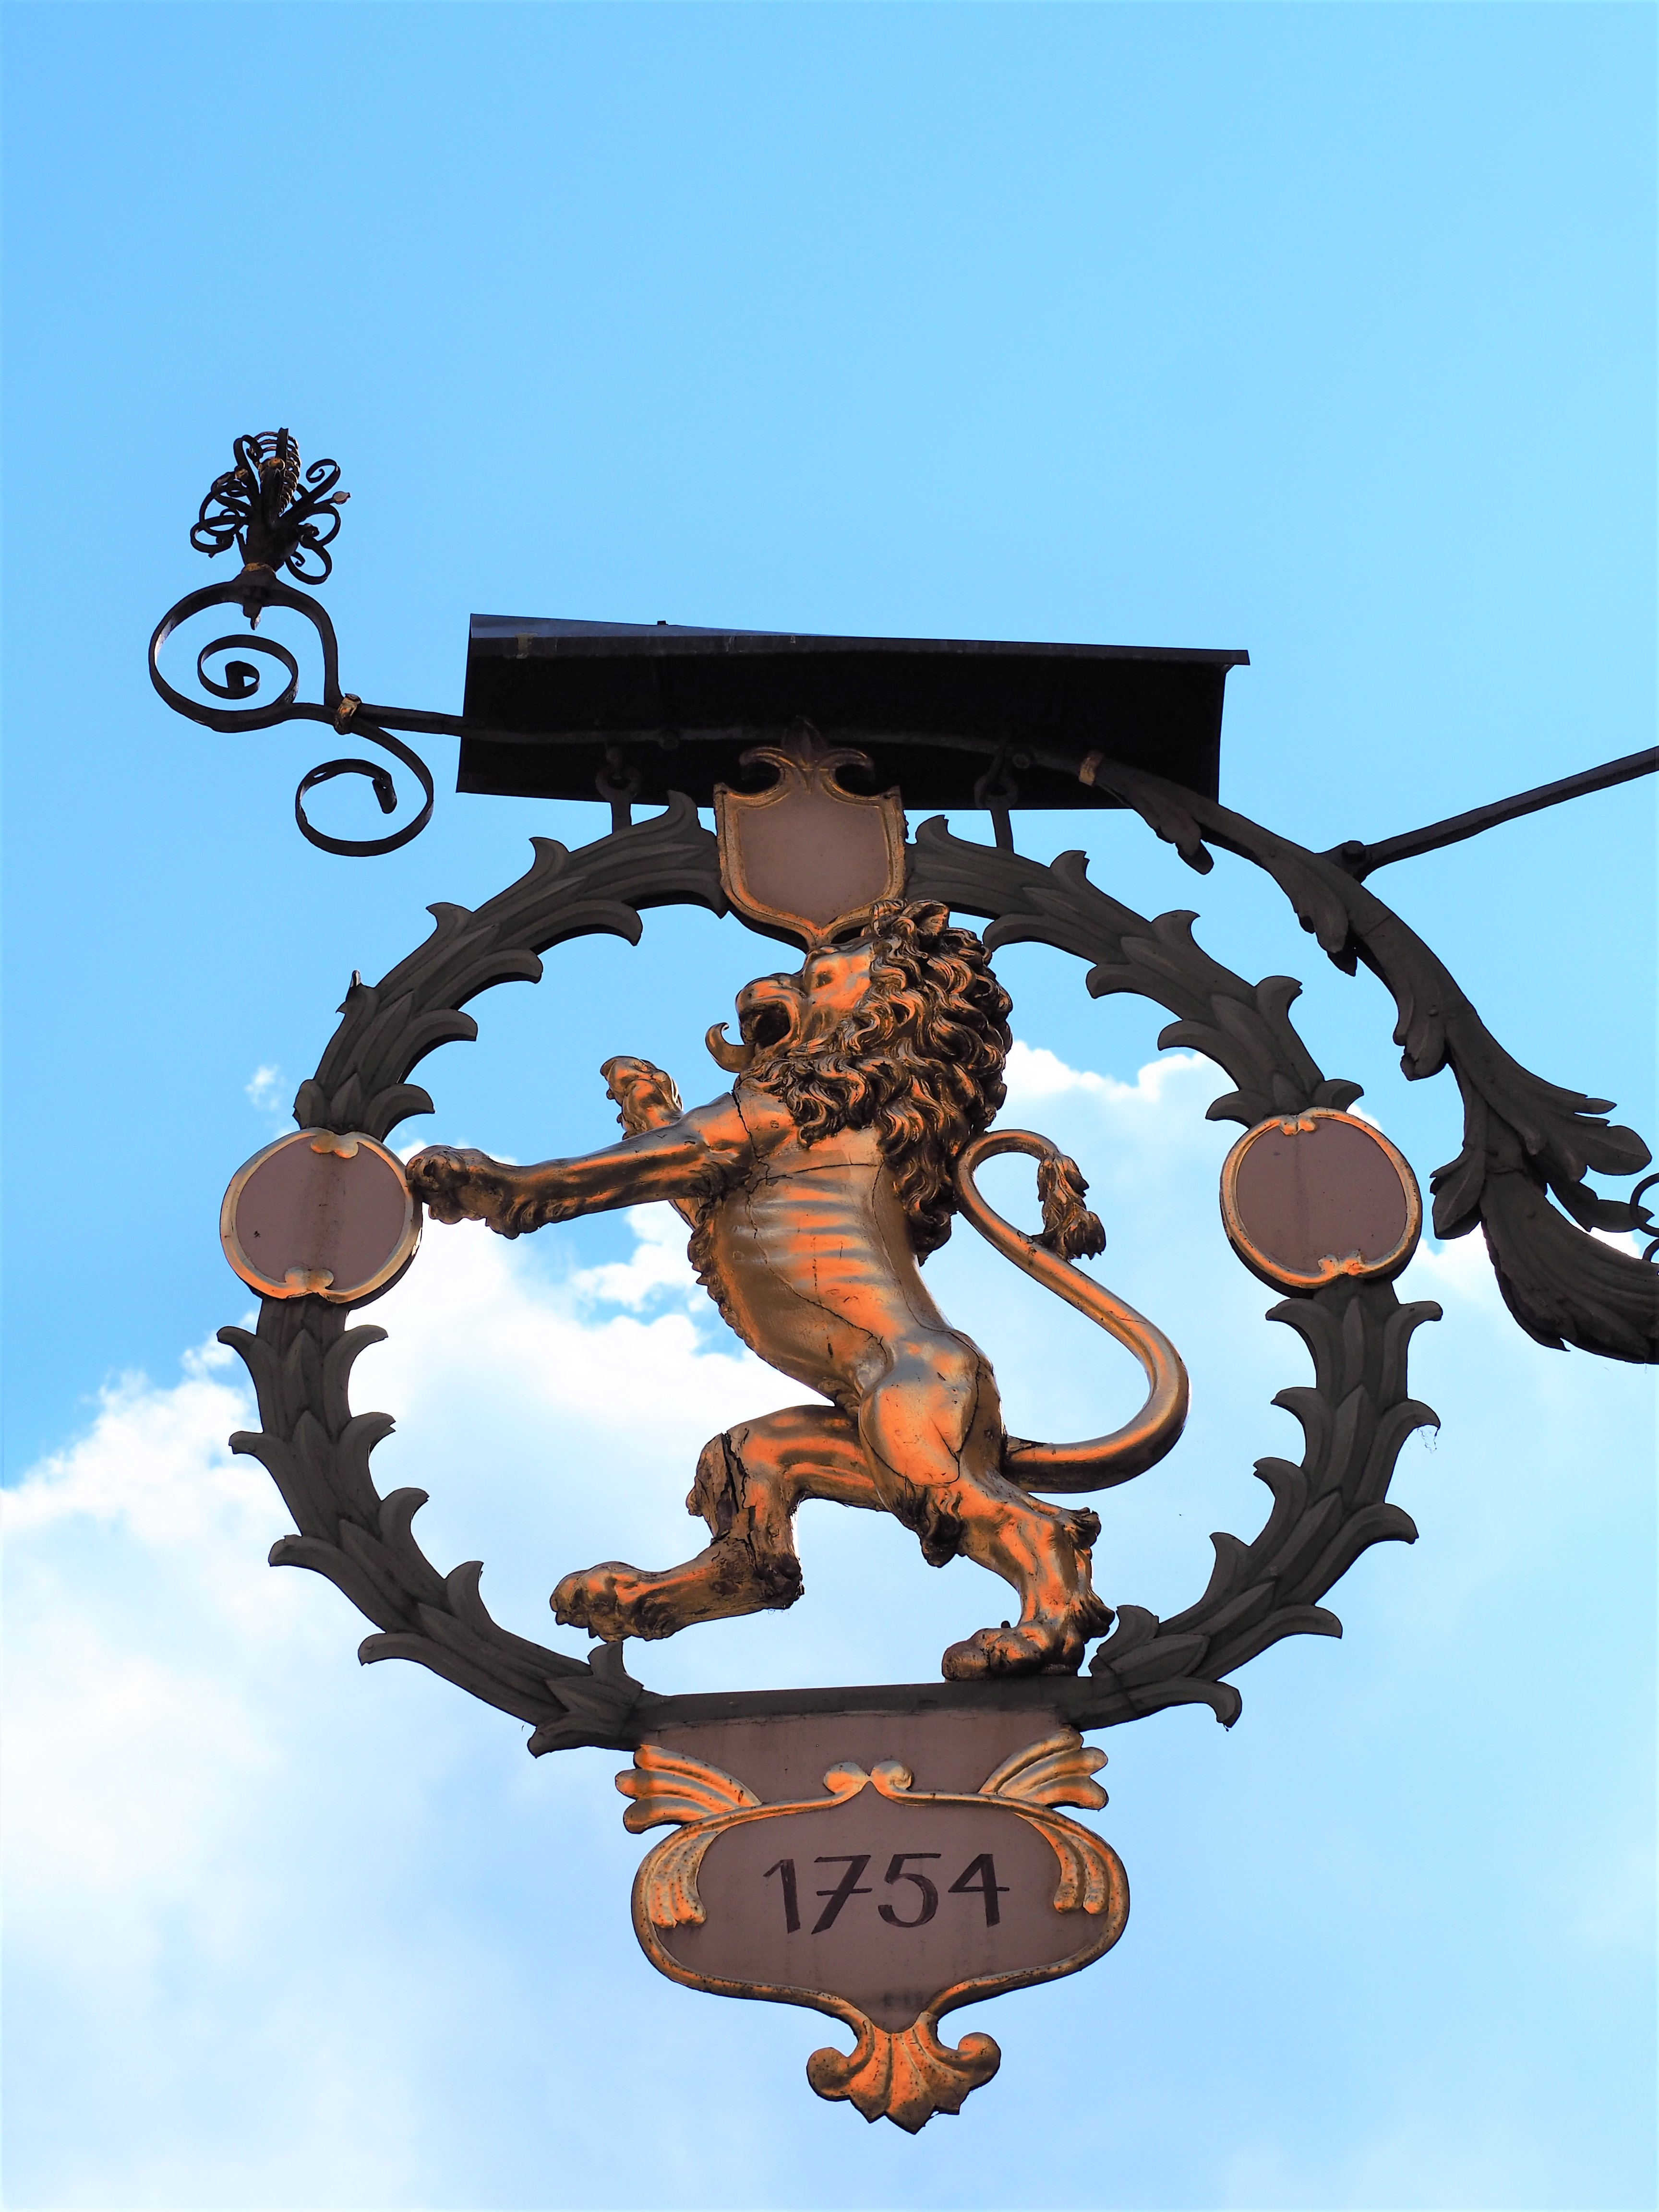 innsbruck-vieille-ville-autriche